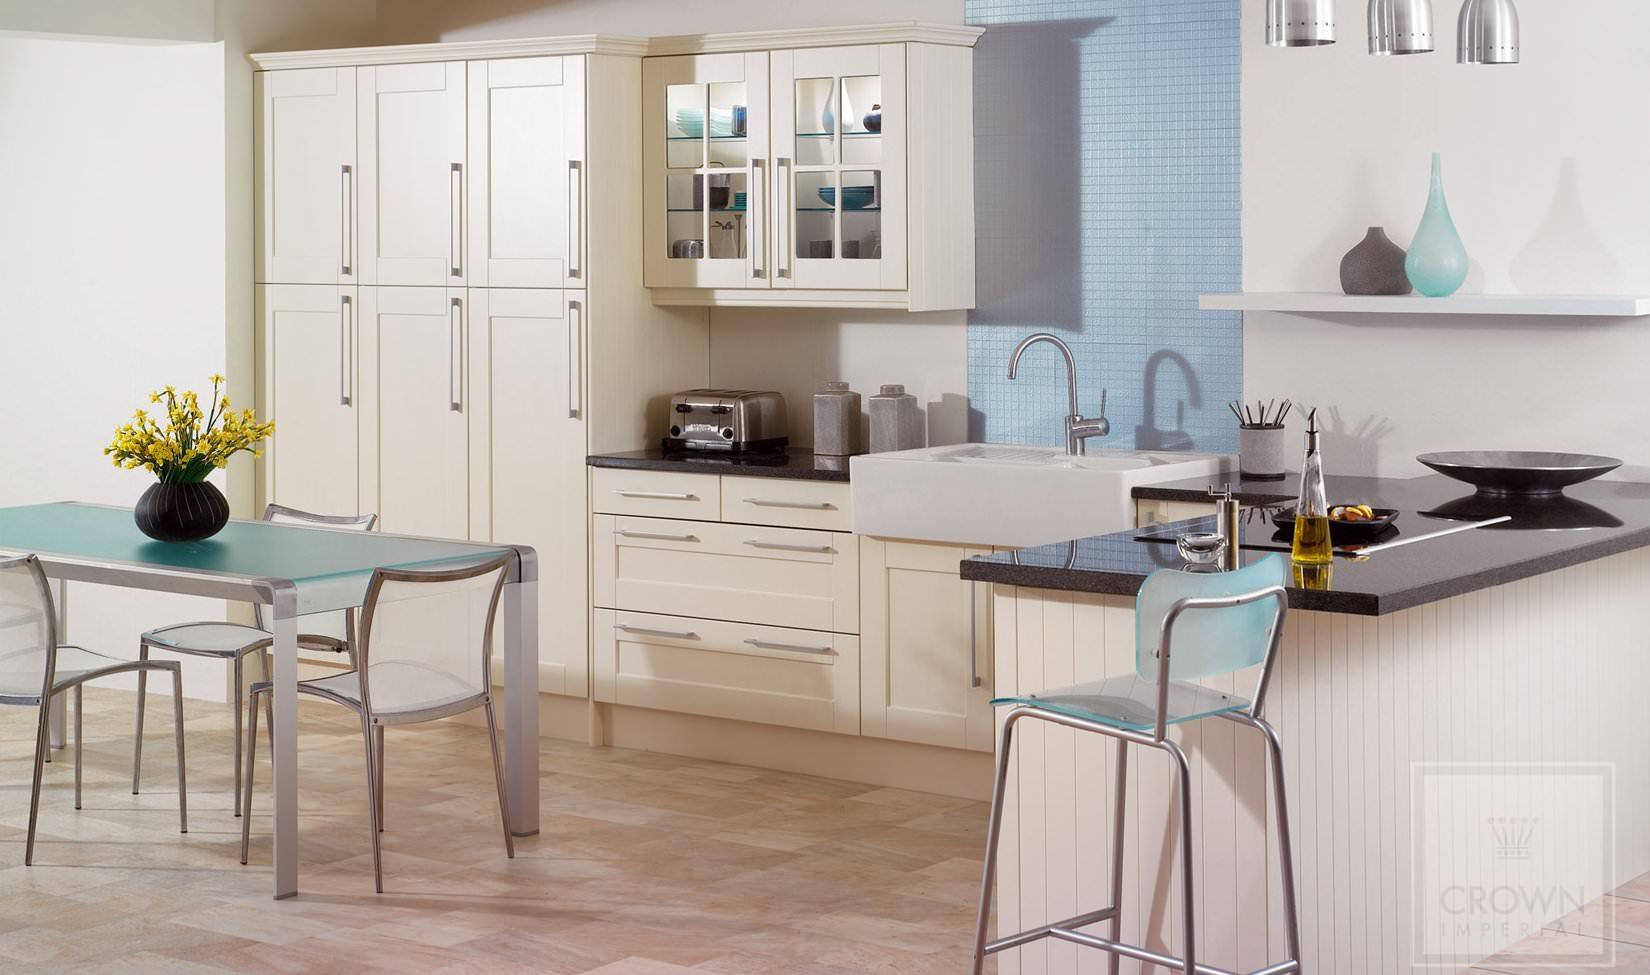 Kitchen Design And Fitting Tollgate Kitchens Bespoke Kitchen Design Service